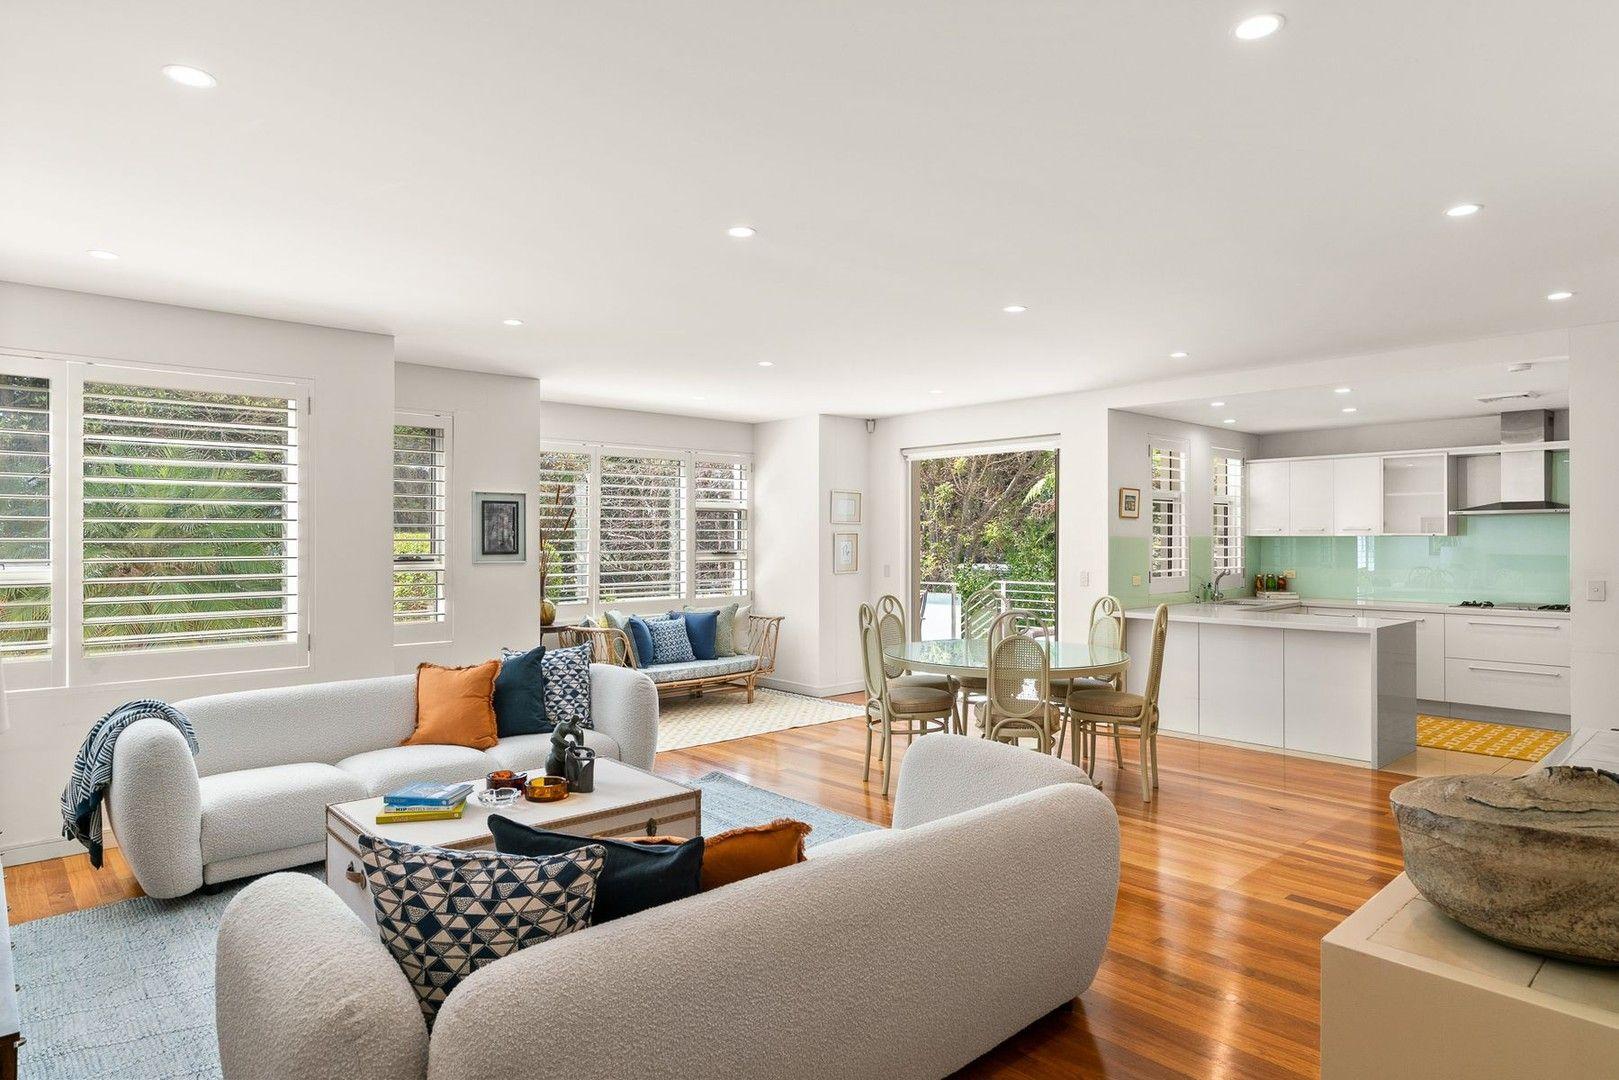 3 bedrooms Apartment / Unit / Flat in 1/247 O'Sullivan Road BELLEVUE HILL NSW, 2023